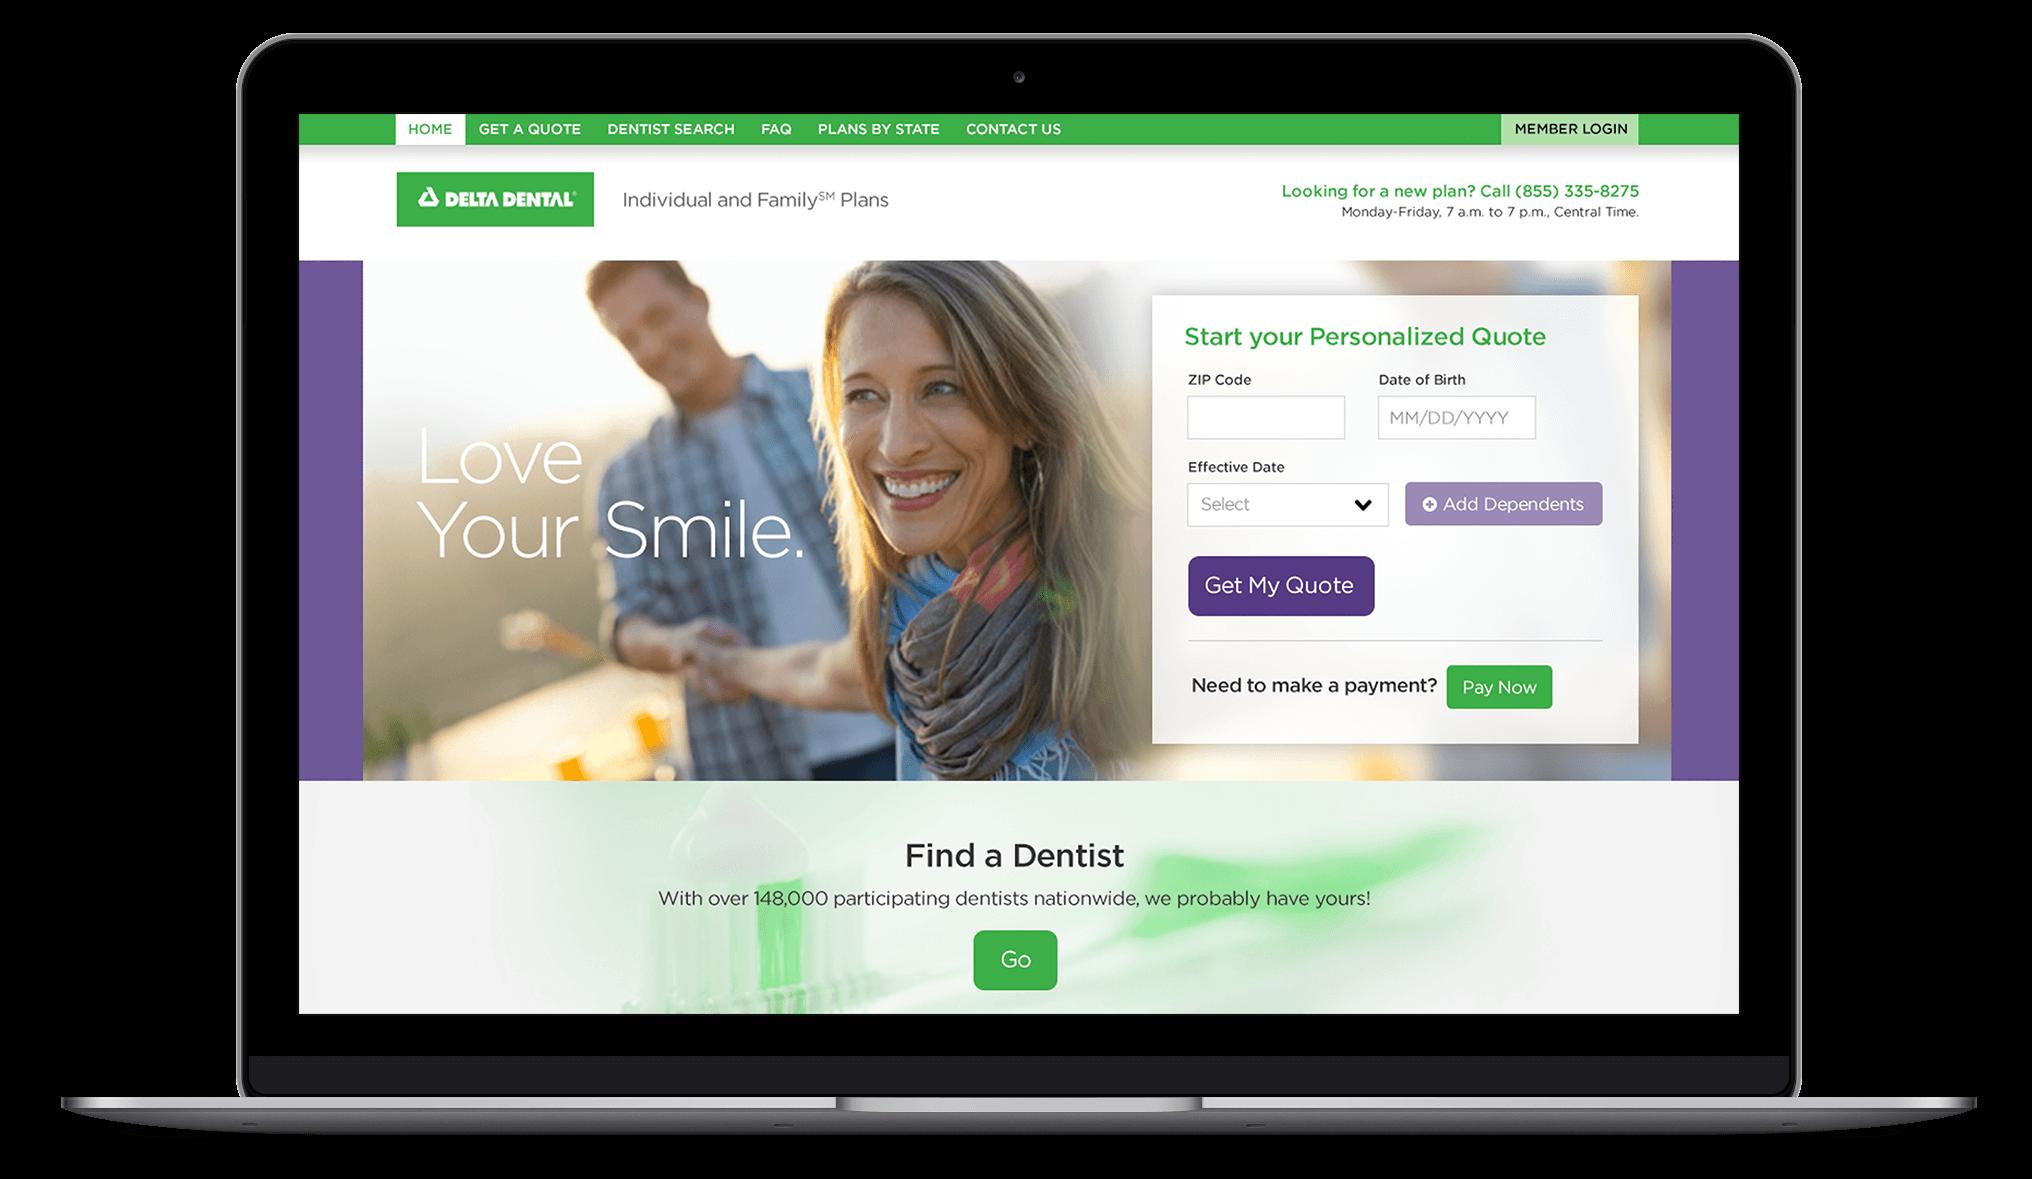 Delta Dental Landing Page